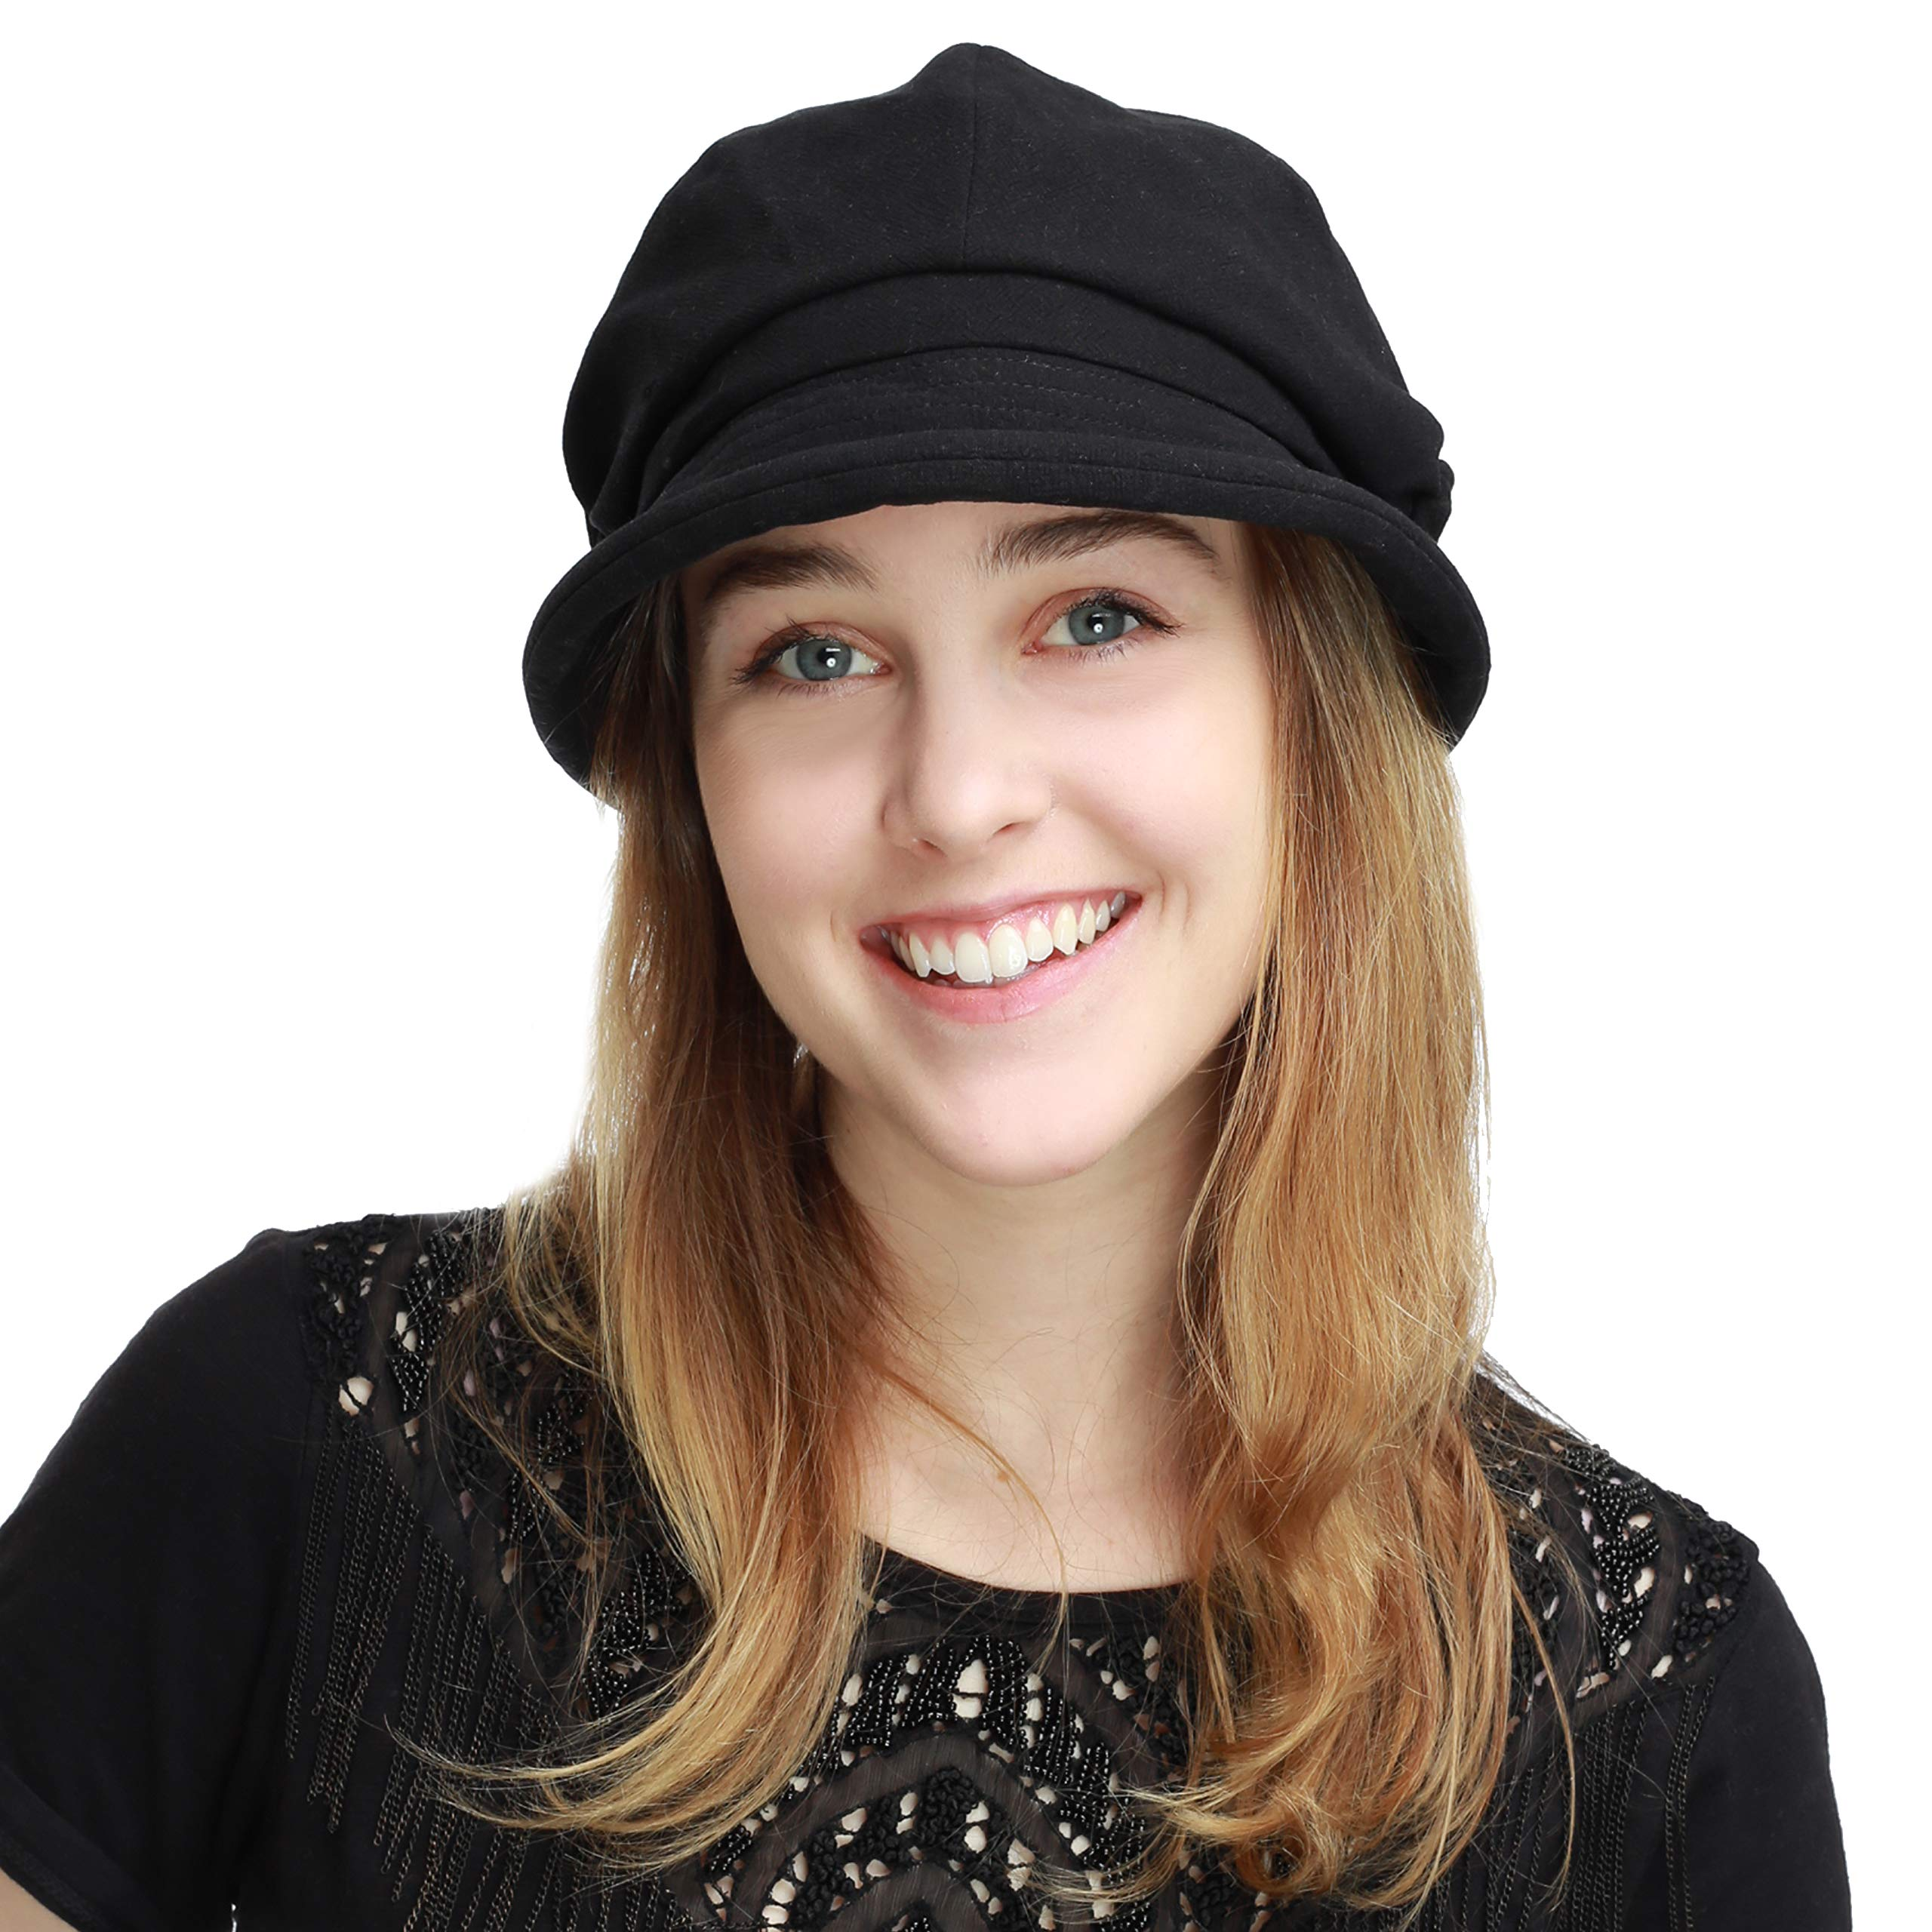 Womens Newsboy Cabbie Beret Cap Cloche Visor Hats (Linen/Cotton- Black)